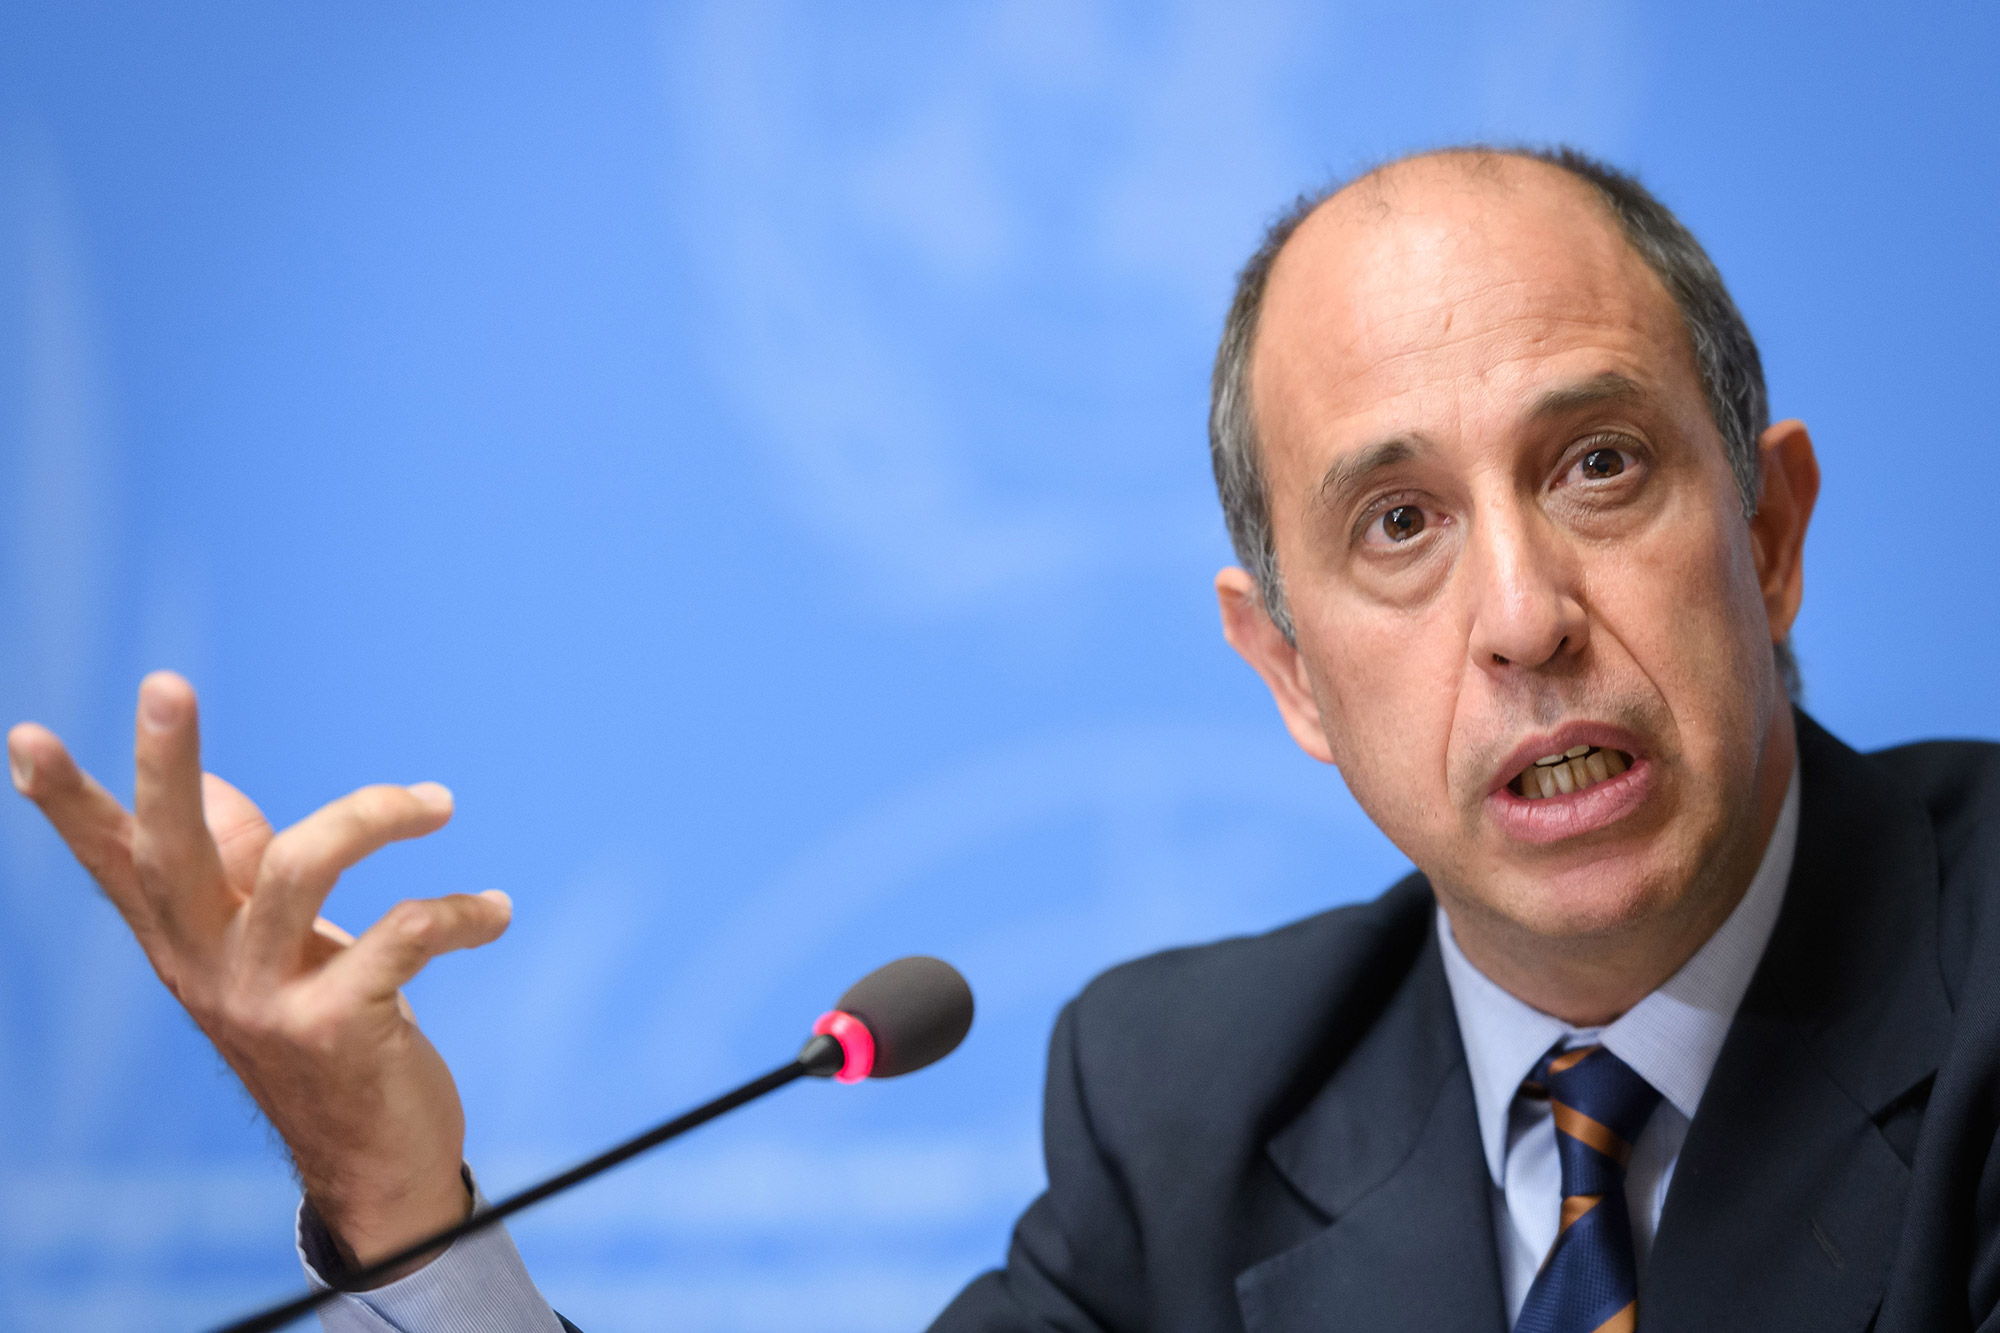 UN Special Rapporteur Tomás Ojea Quintana speaks at a press conference in Geneva in March.